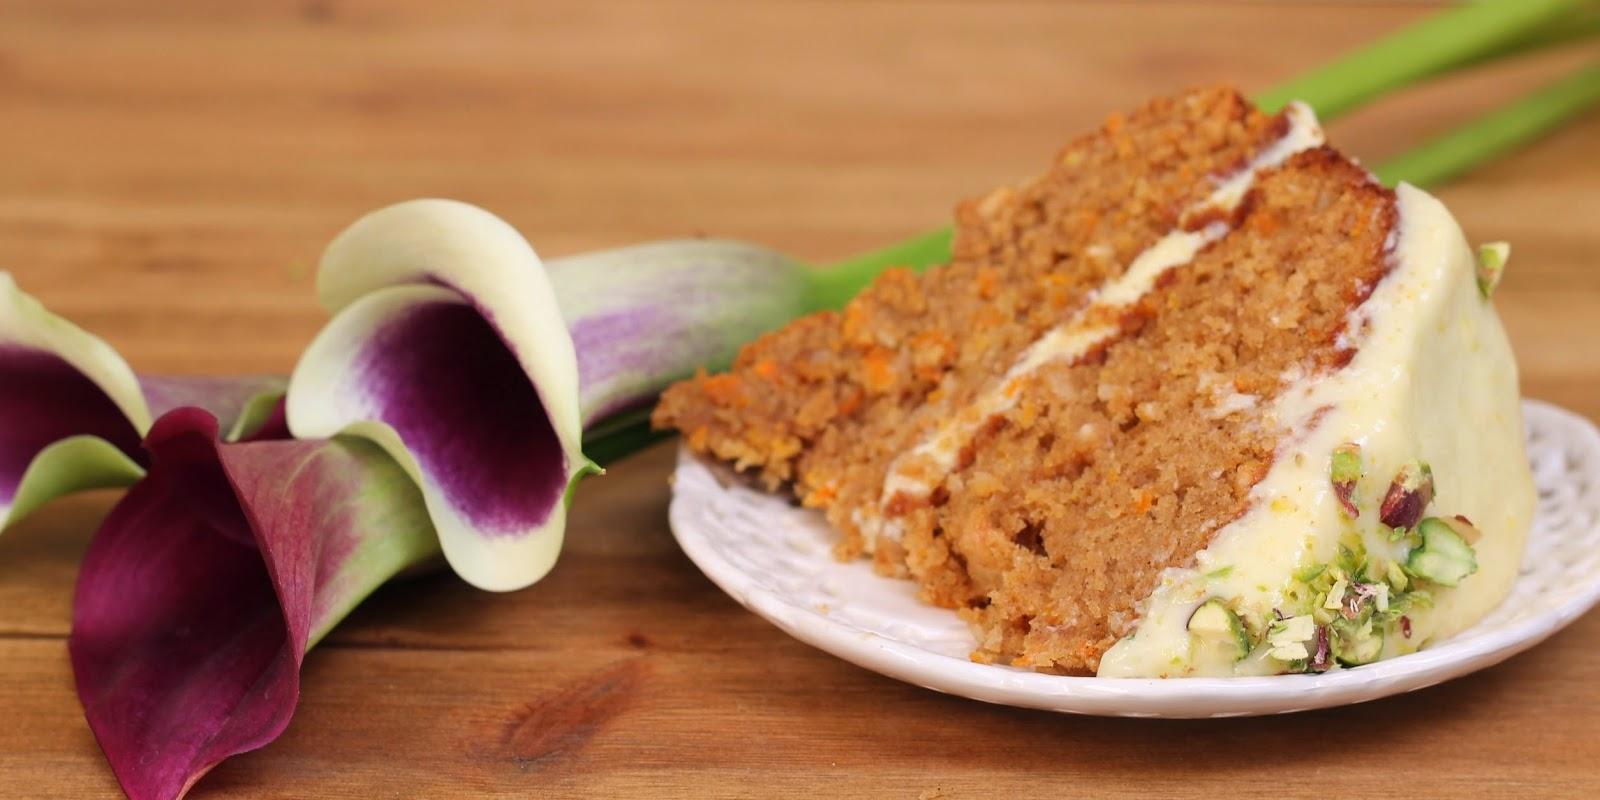 Dulce de leche carrot cake (with chocolate chunks)